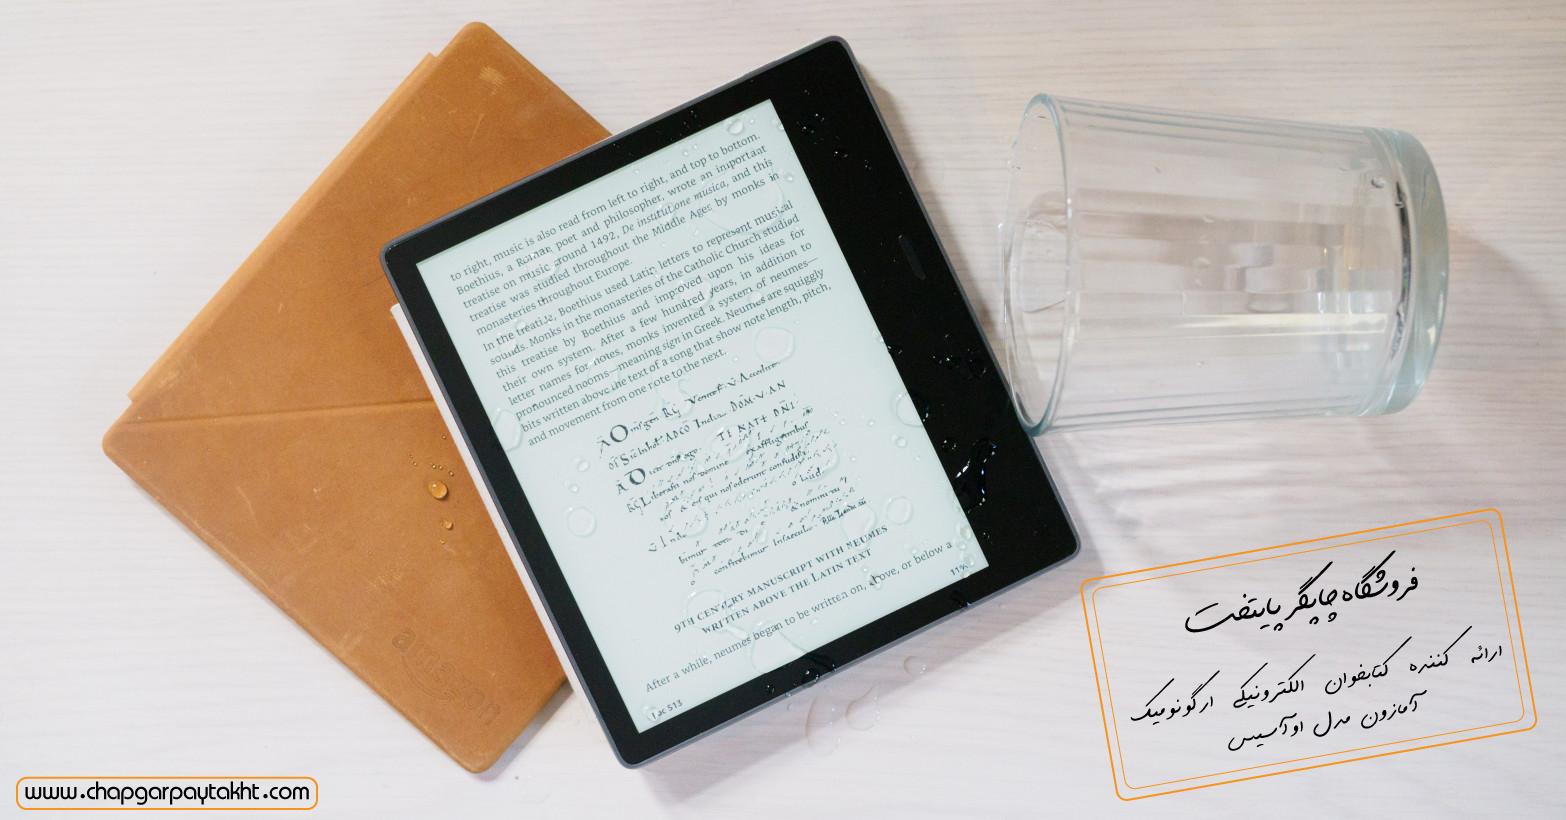 کتابخوان الکترونیکی کیندل اوآسیس ضد آب